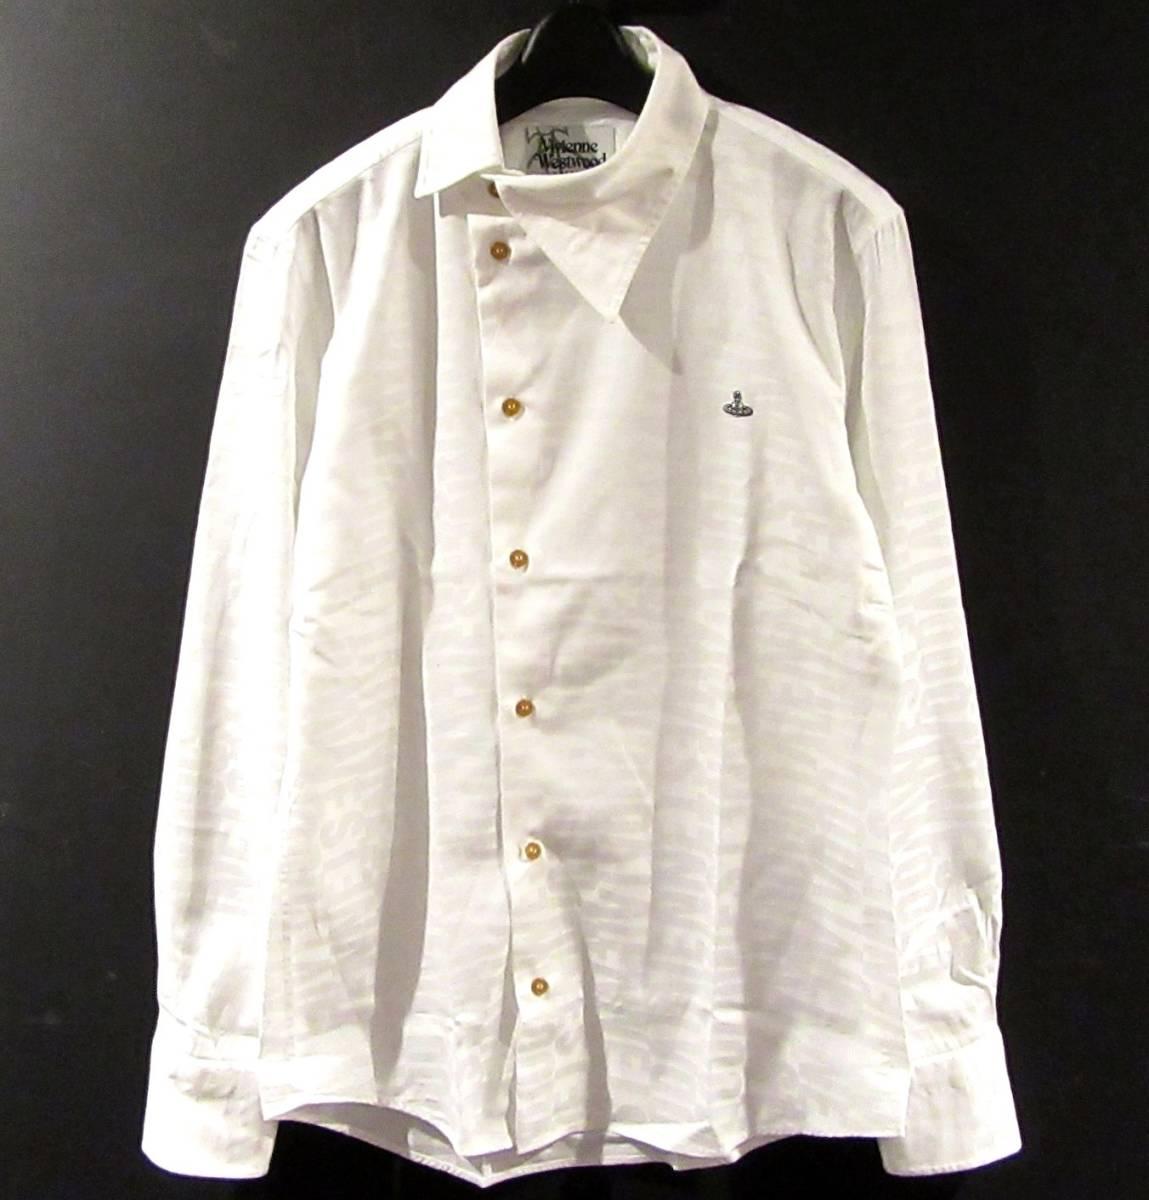 Vivienne Westwood MAN ロゴ総柄 オジークラークシャツ アシンメトリー コットン ブラウス 白 ORB刺繍 オーブ_画像1